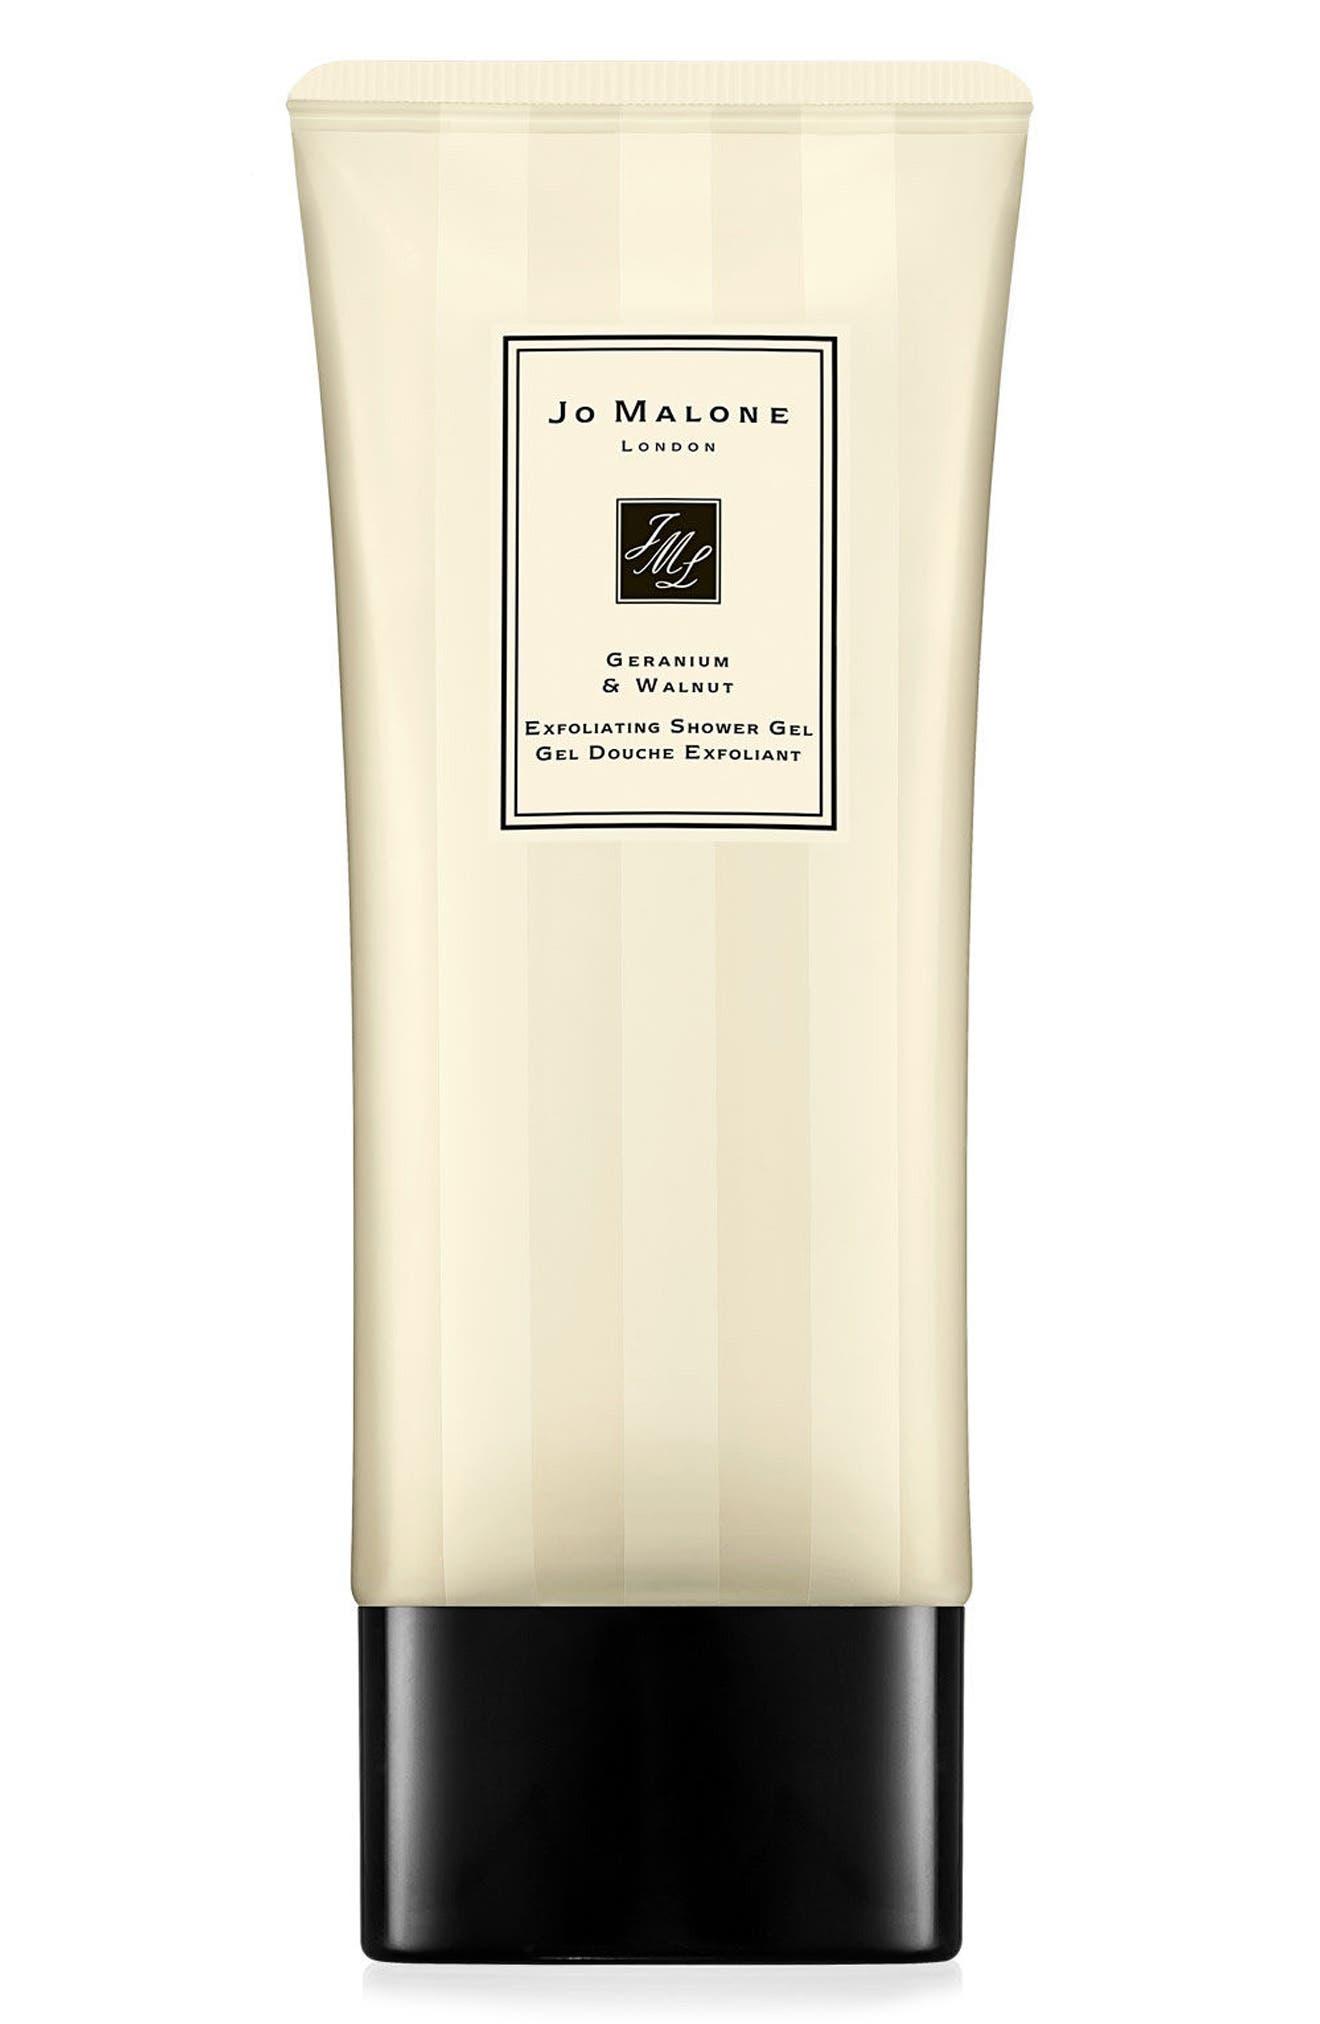 Alternate Image 1 Selected - Jo Malone London™ Geranium & Walnut Exfoliating Shower Gel